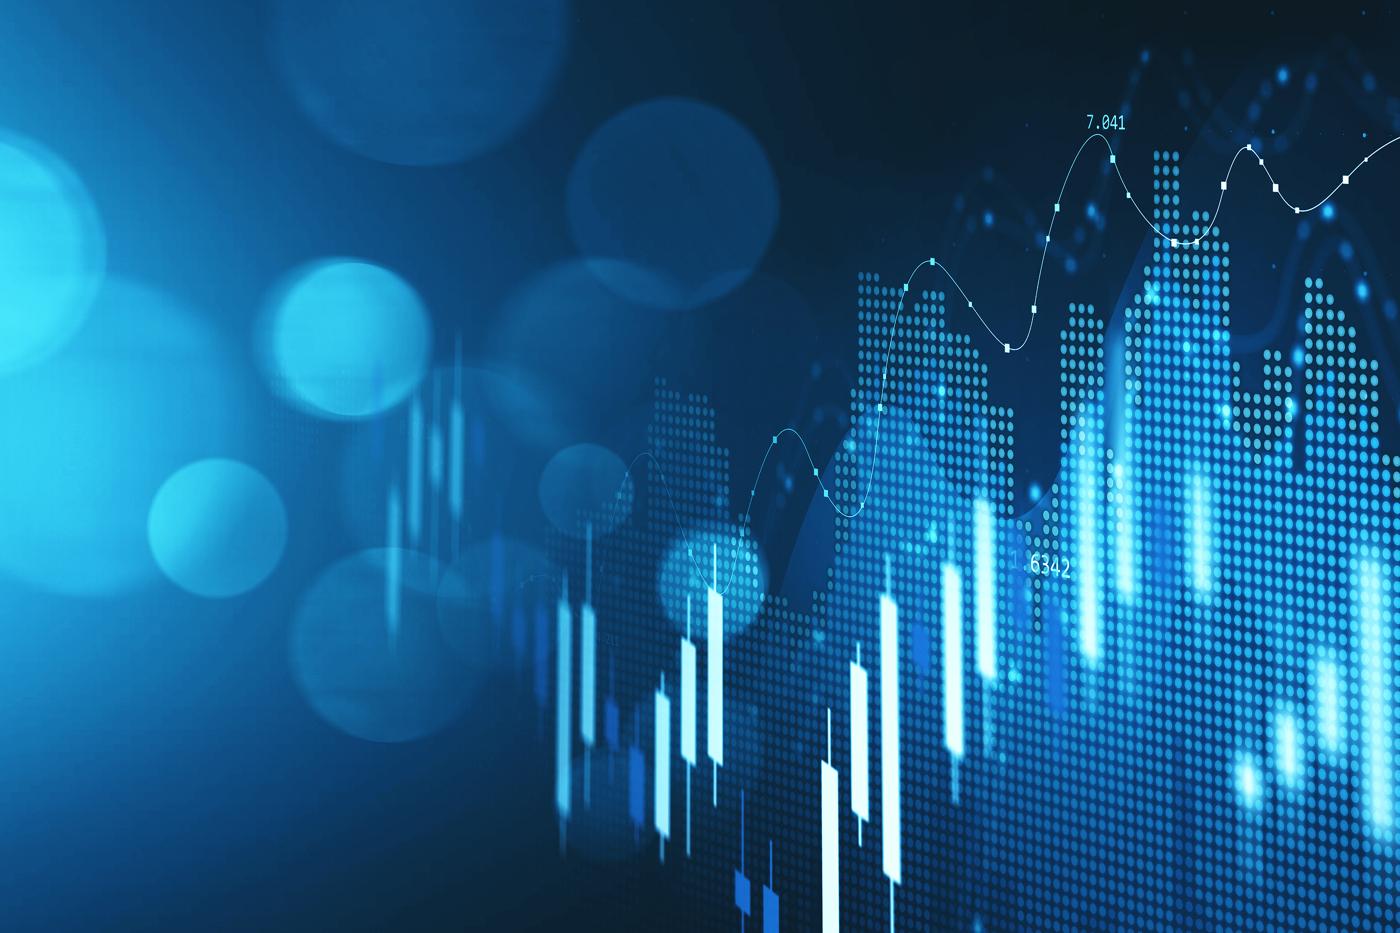 Stock price increasing chart, stock soaring, bullish run, stock increase